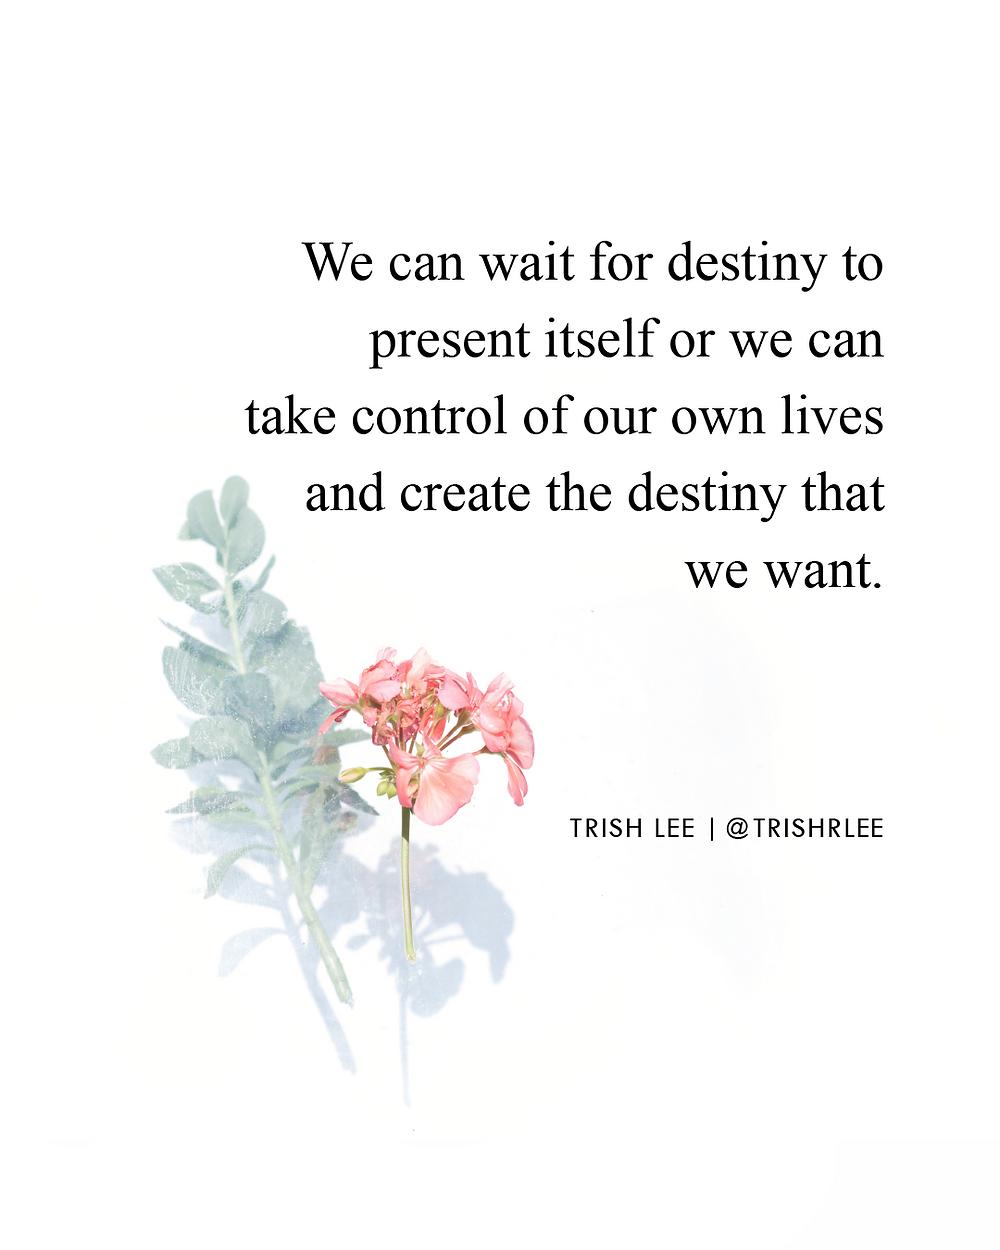 Choose Your Life's Destiny - Make It Or Wait For It